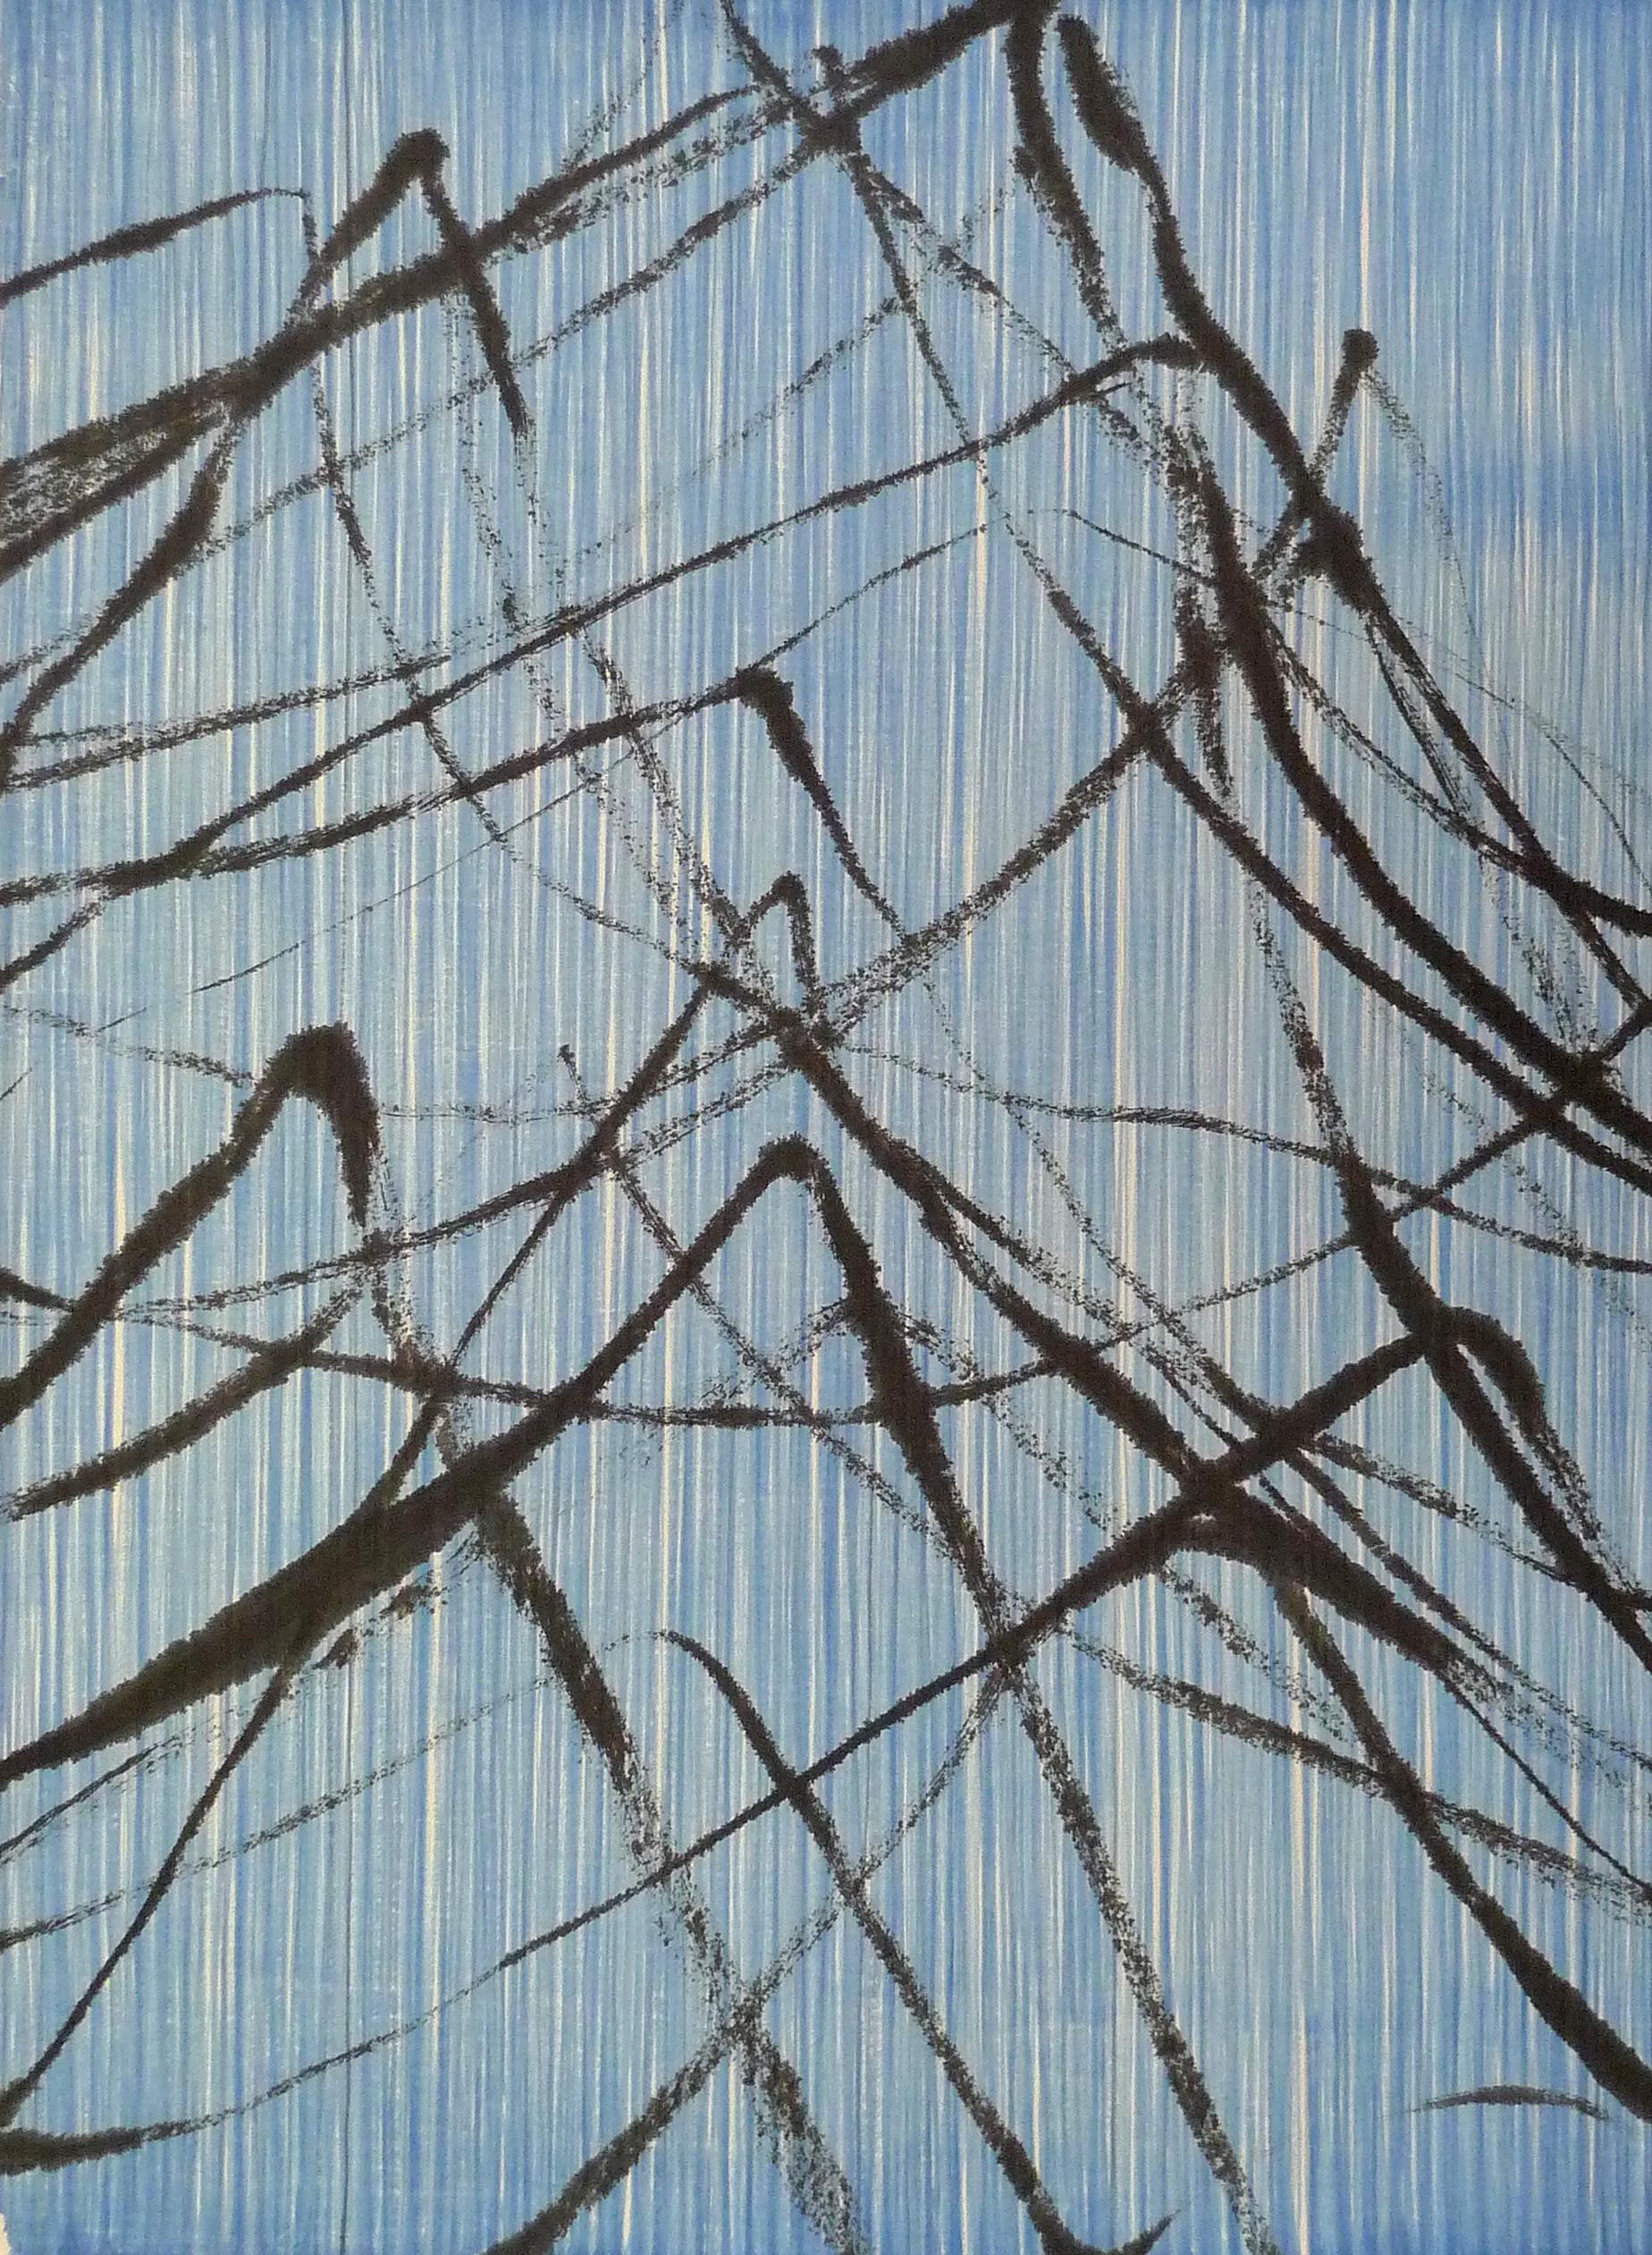 Zhou Jianjun 周建军, Untitled 无题, 2016, Ink and acrylic on paper 纸本水墨丙烯, 145 x 105 cm